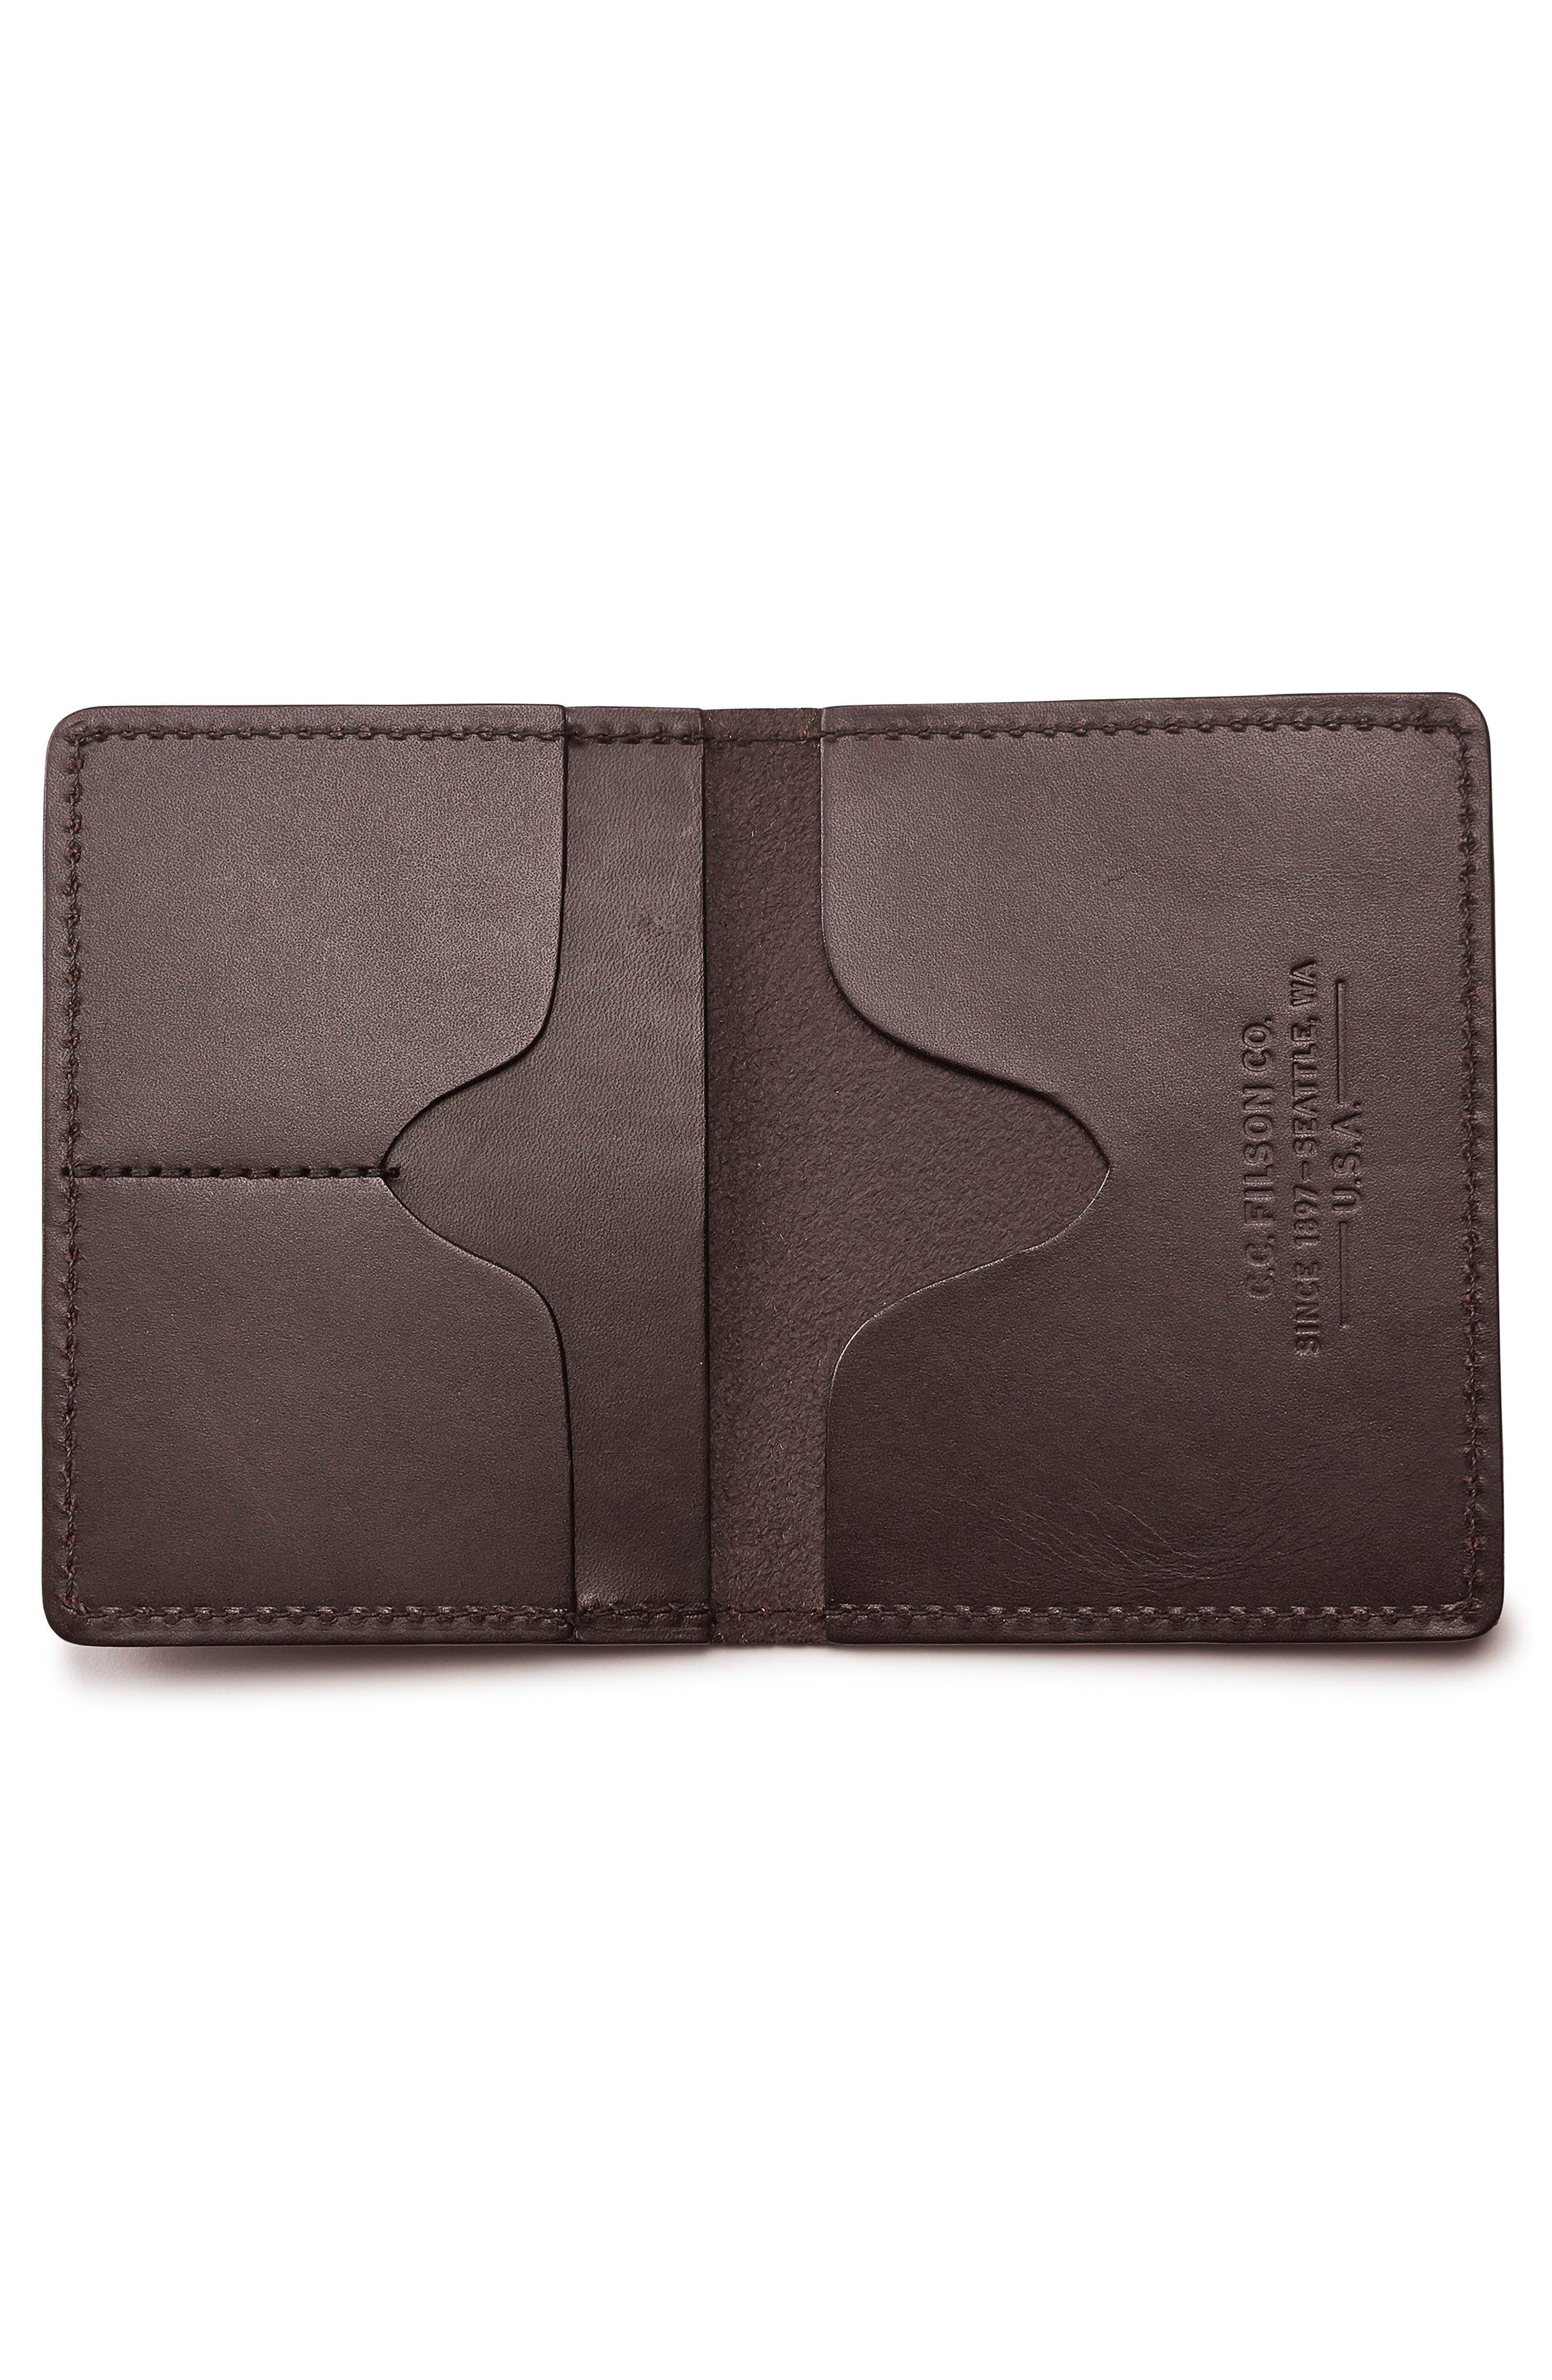 Leather Passport Case,                             Alternate thumbnail 2, color,                             BROWN